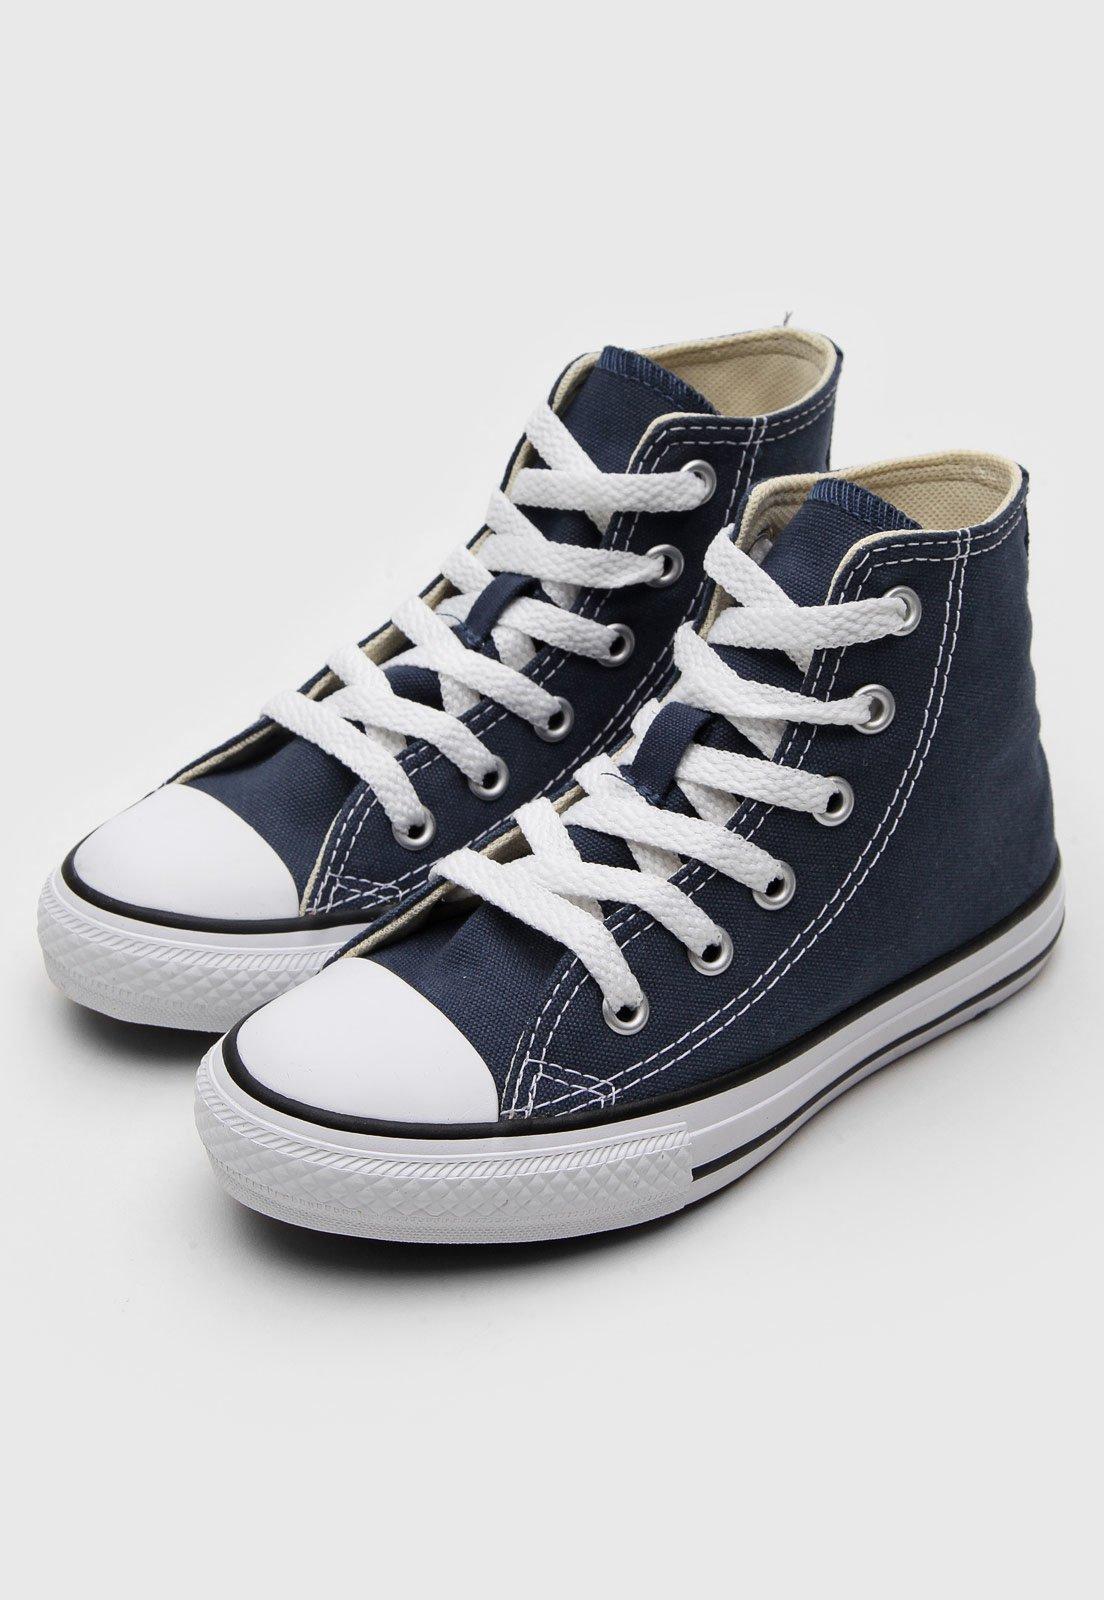 0f8549c615a Tênis Converse Chuck Taylor All Star Azul - Compre Agora